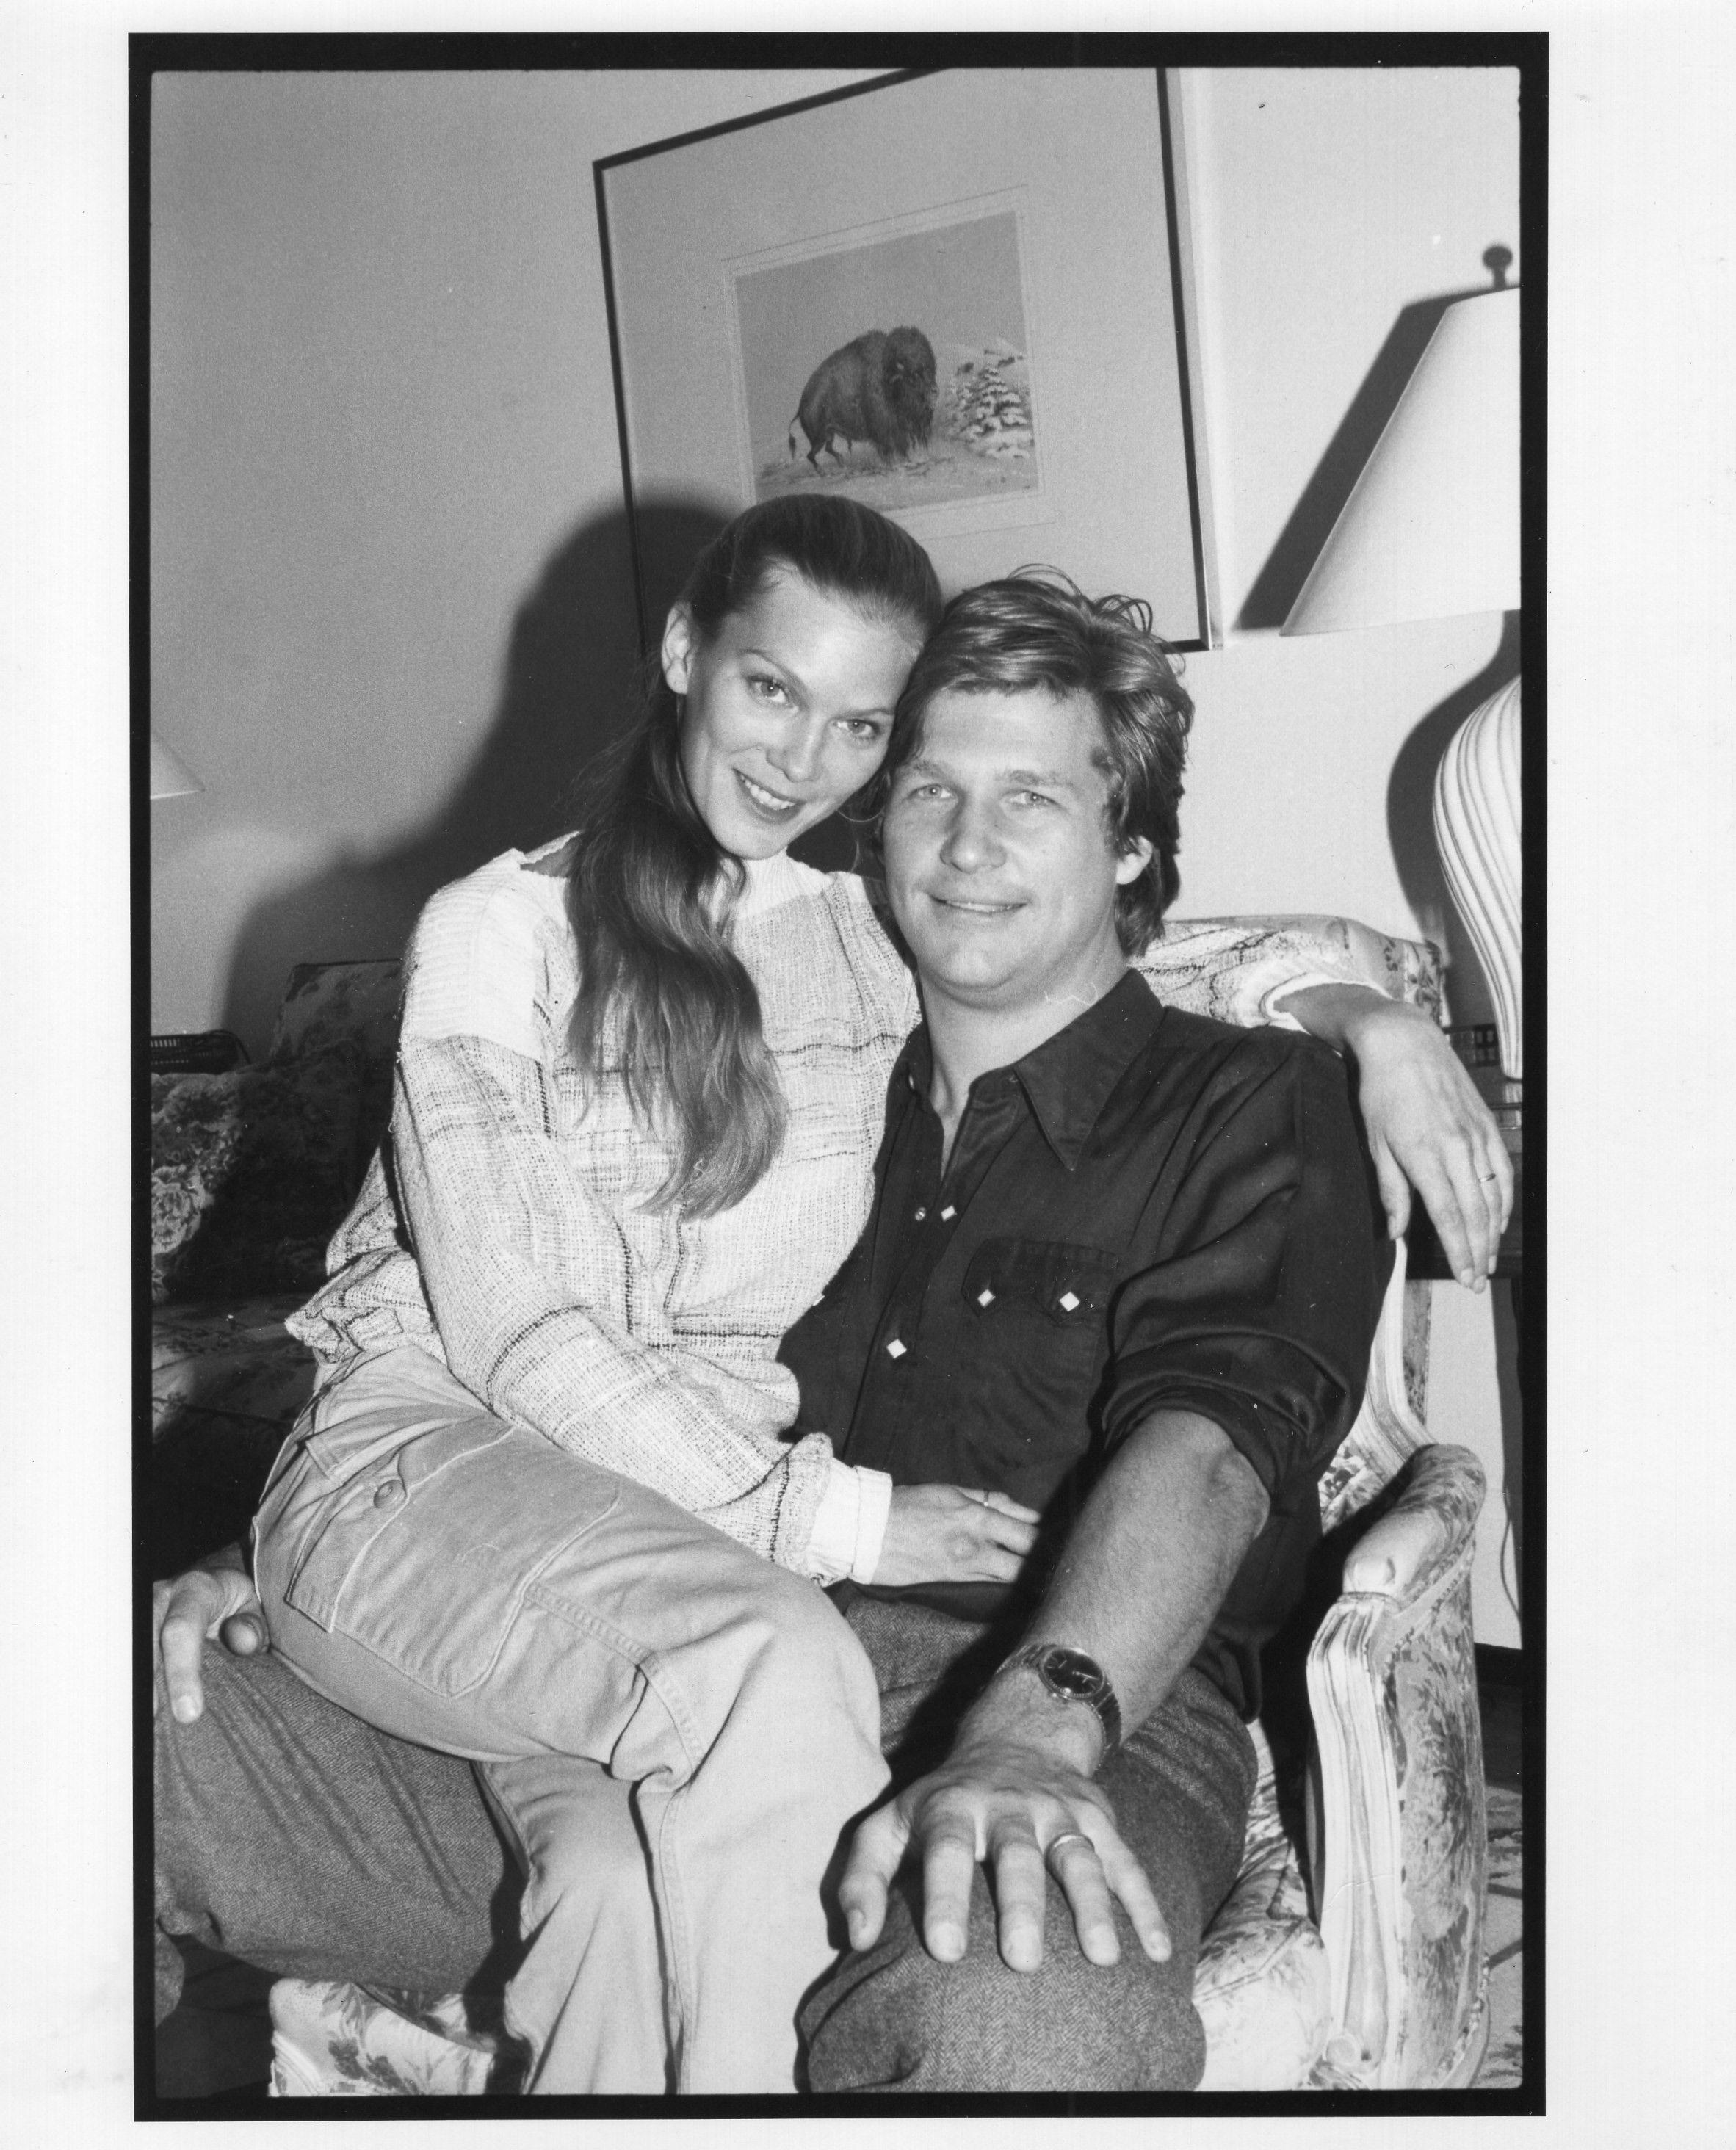 Jeff-Bridges-1866_Sep-21-1978.jpg